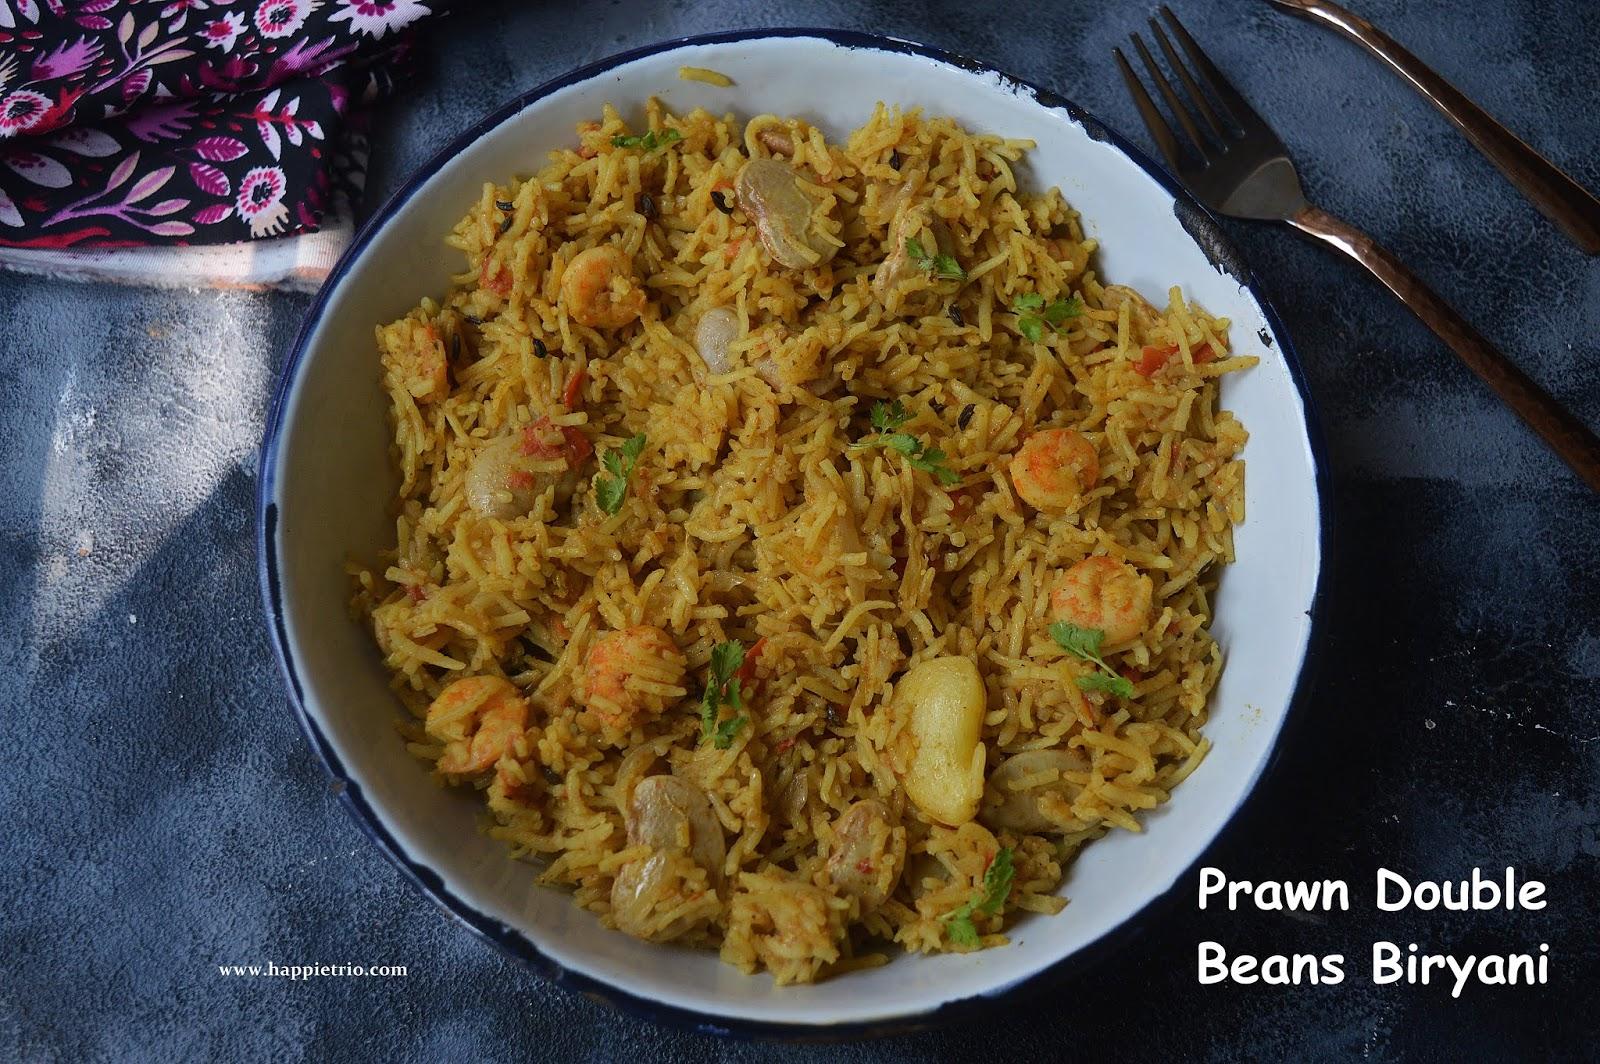 Prawns Double Beans Biryani Recipe | Iral Double Beans Biryani